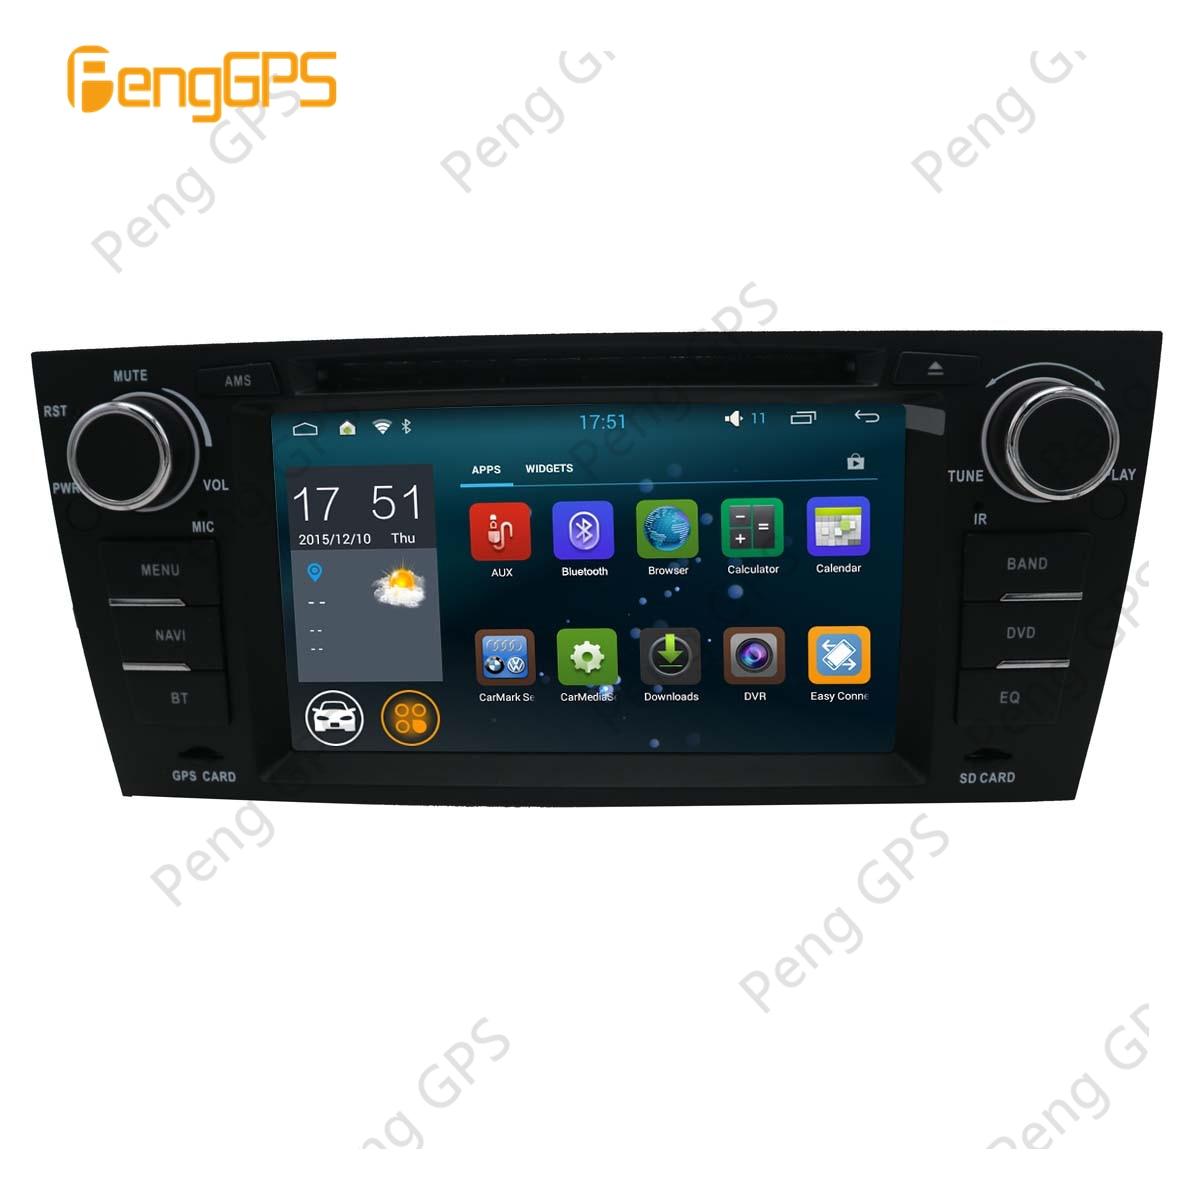 Автомобильный CD DVD плеер 2 Din стерео Android радио для BMW E90 E91 E92 E93 3 серии 2005-2012 GPS навигация головное устройство WIFI FM